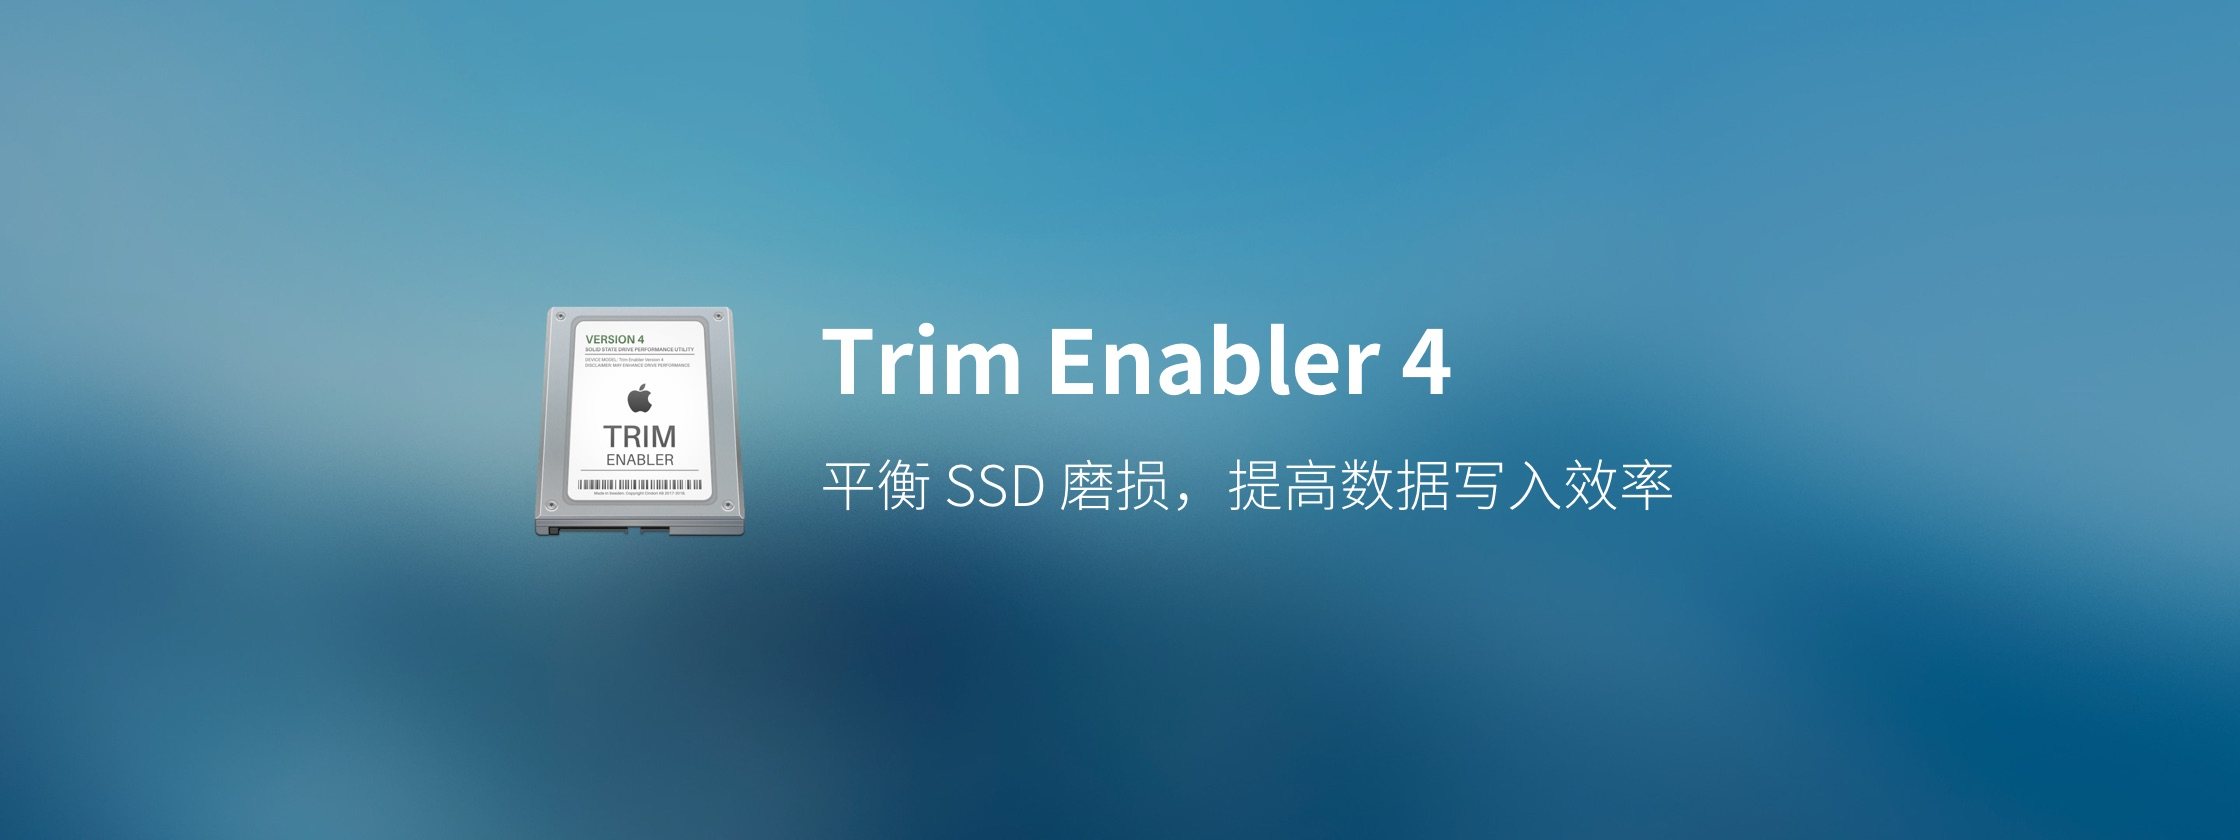 用 Trim Enabler 一键开启 SSD Trim 功能